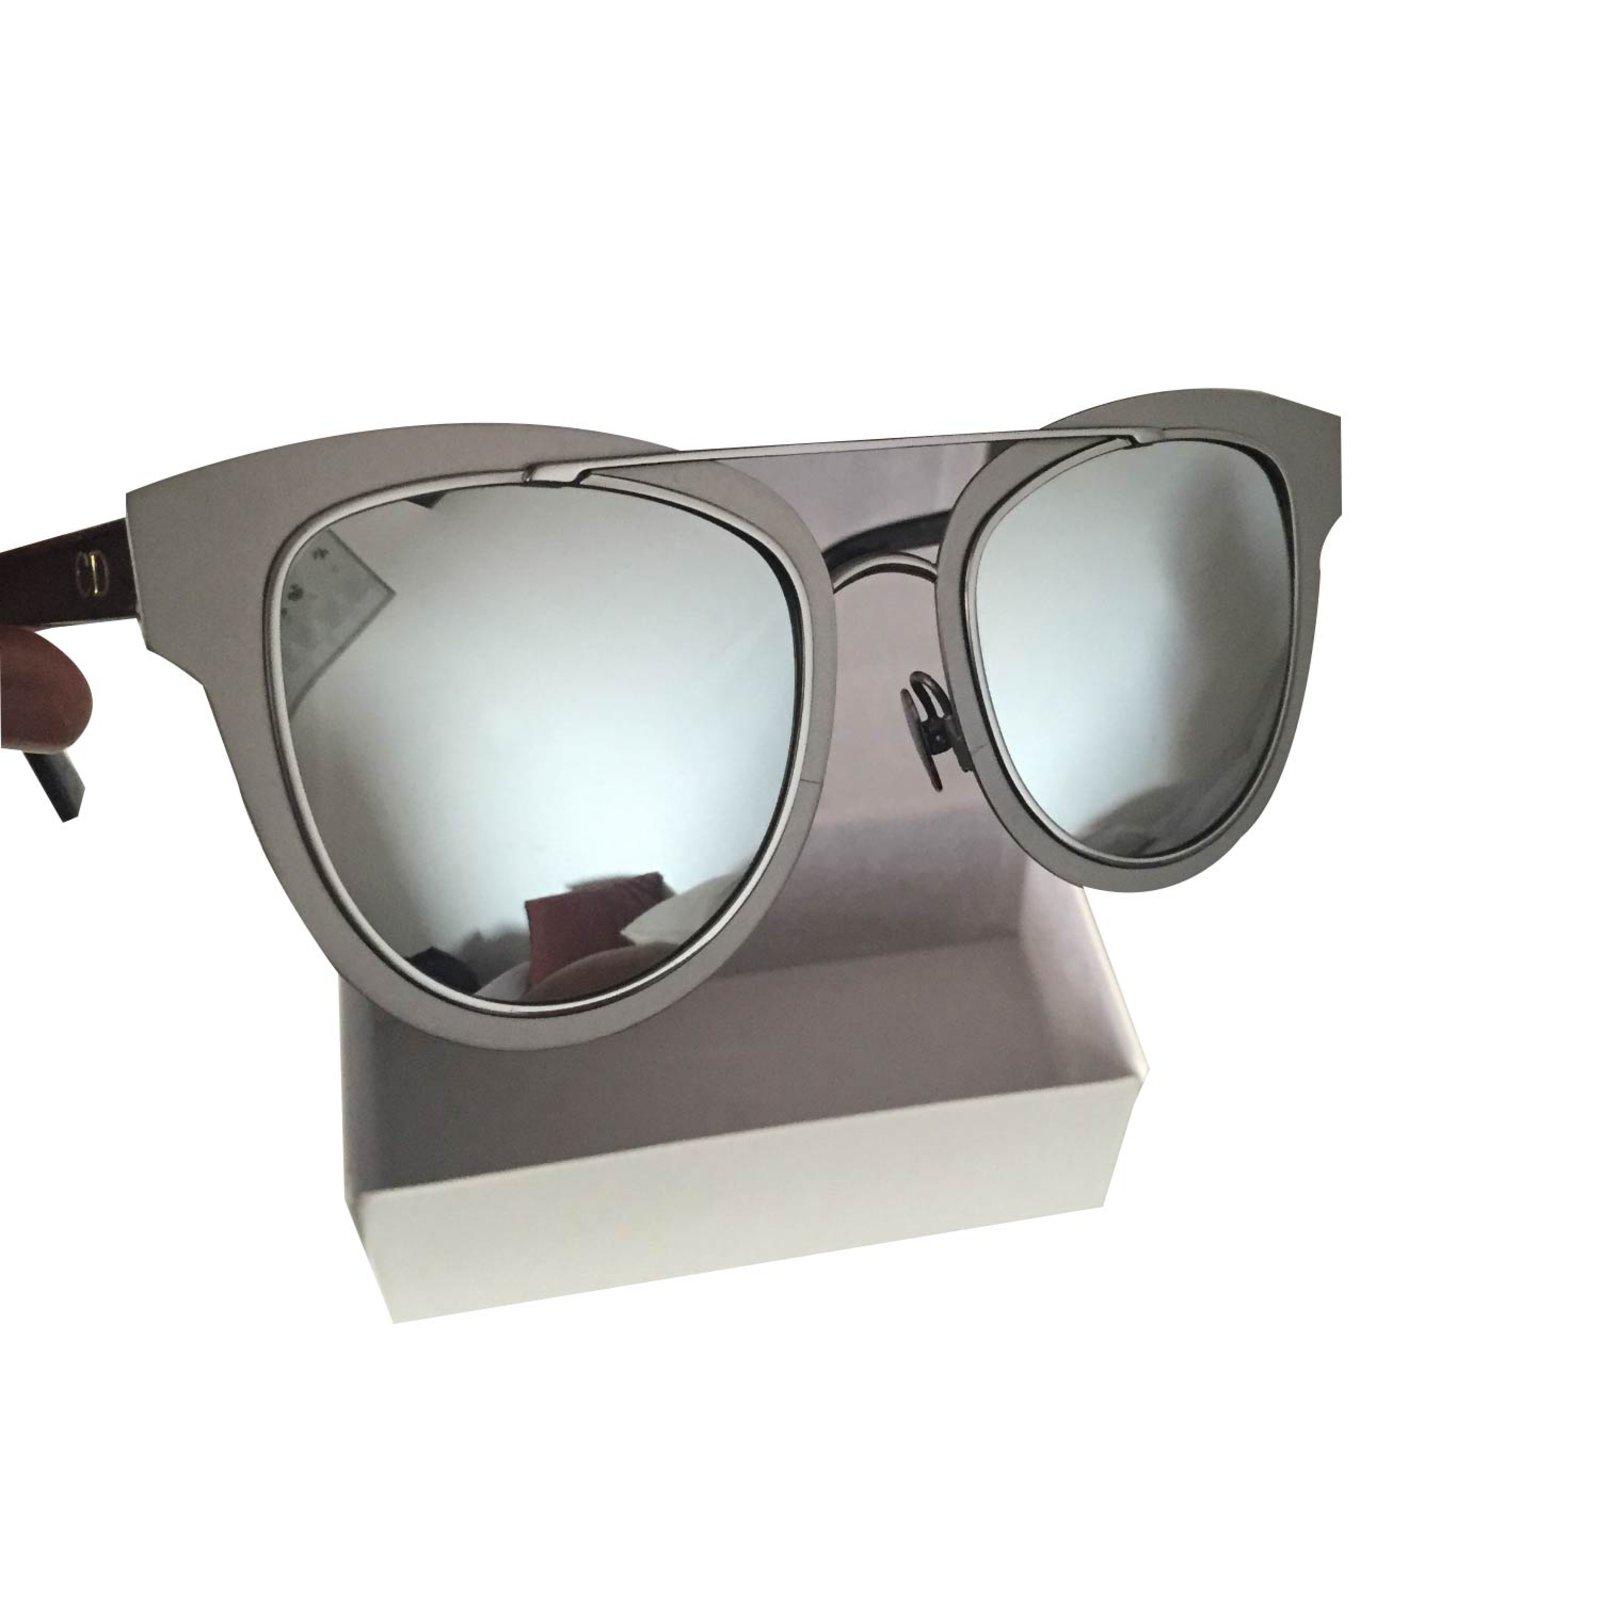 b9f9976056 Christian Dior Sunglasses Sunglasses Metal Grey ref.15553 - Joli Closet